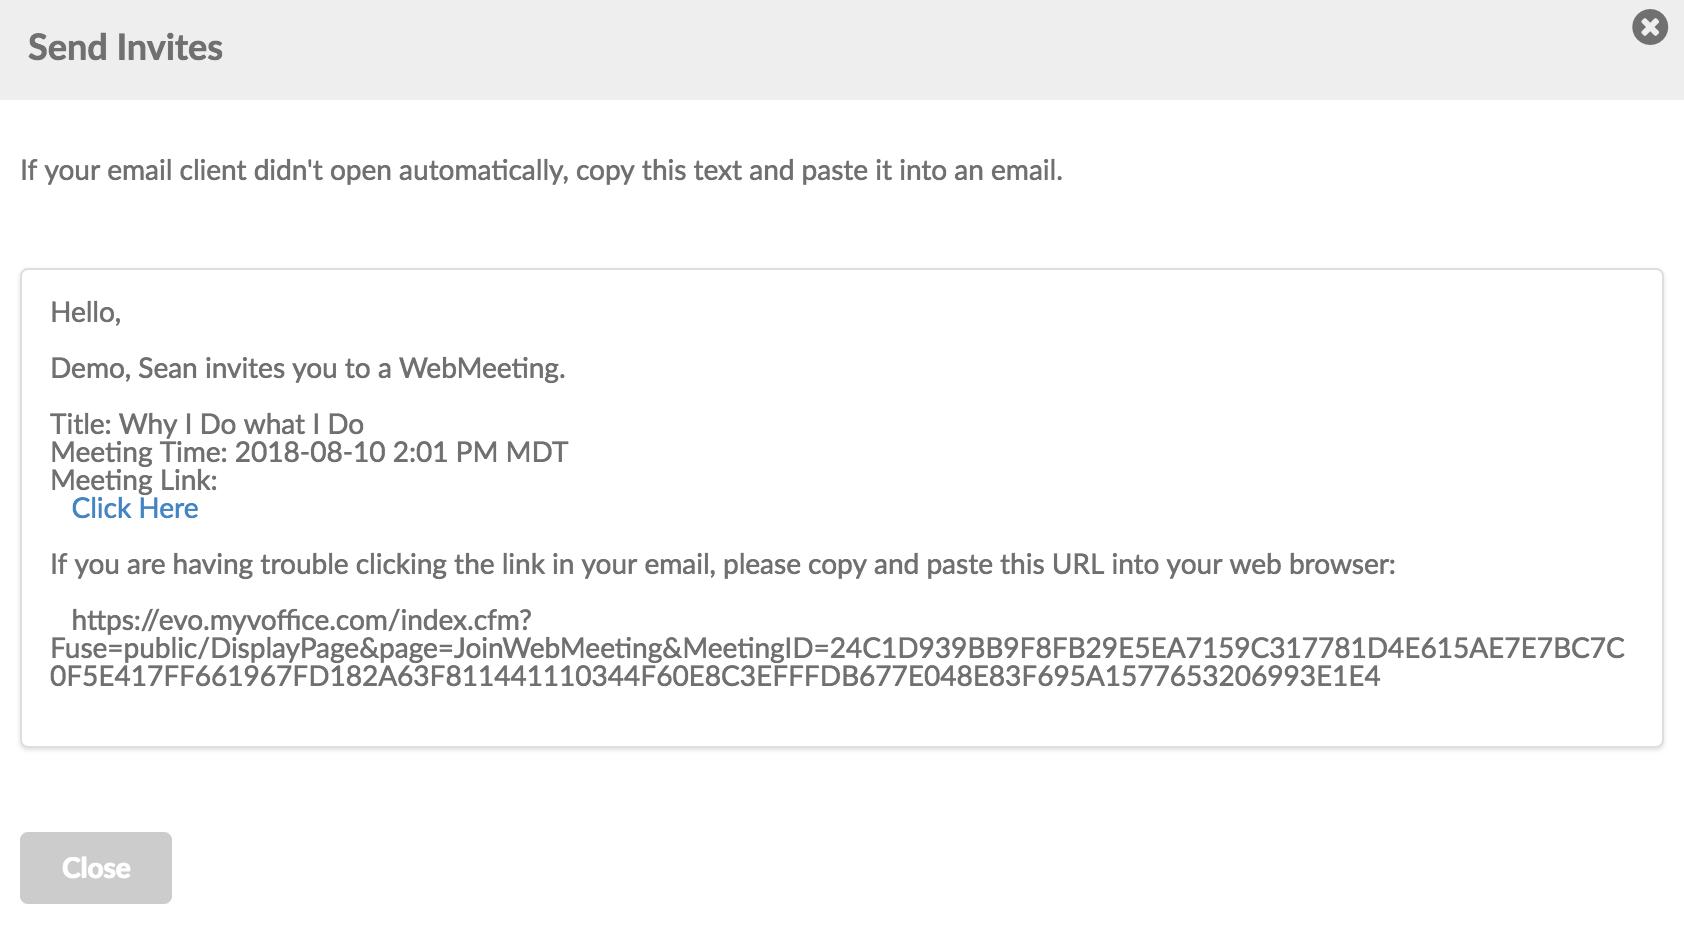 Evo Engage Send invites emails